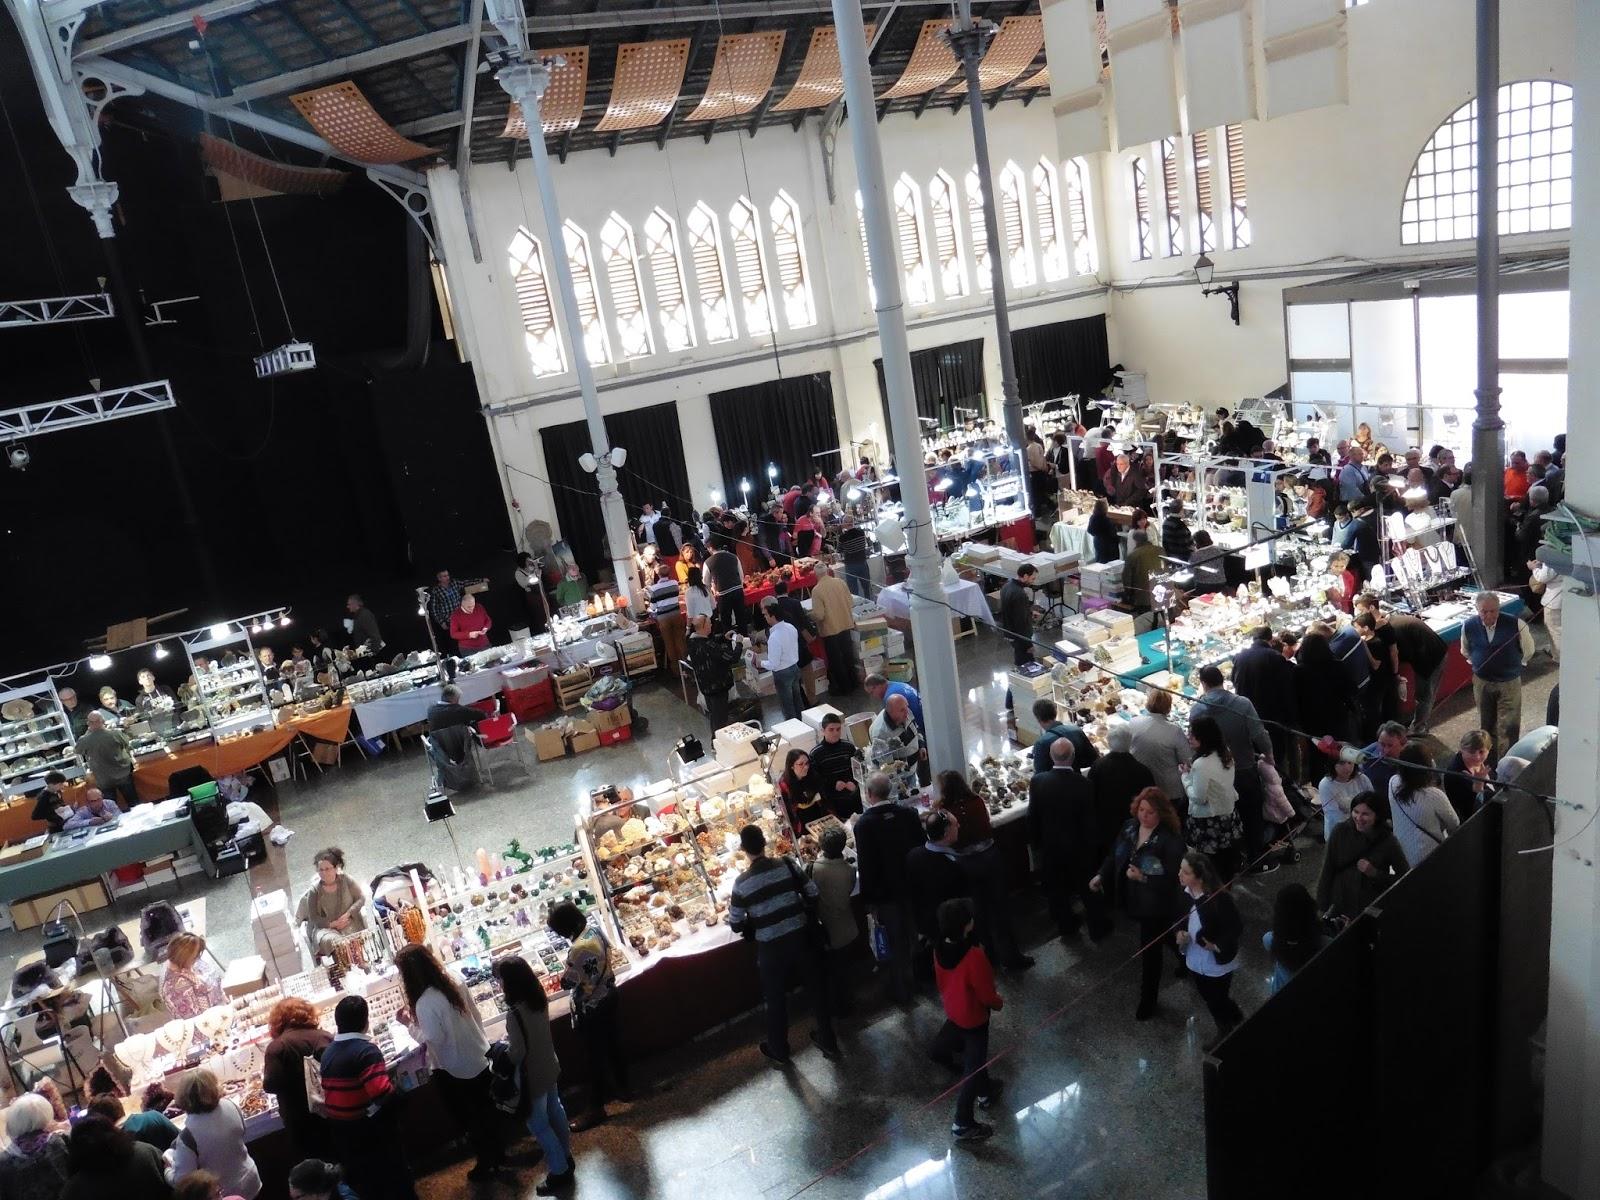 Feria de La Union - Página 2 P1030080